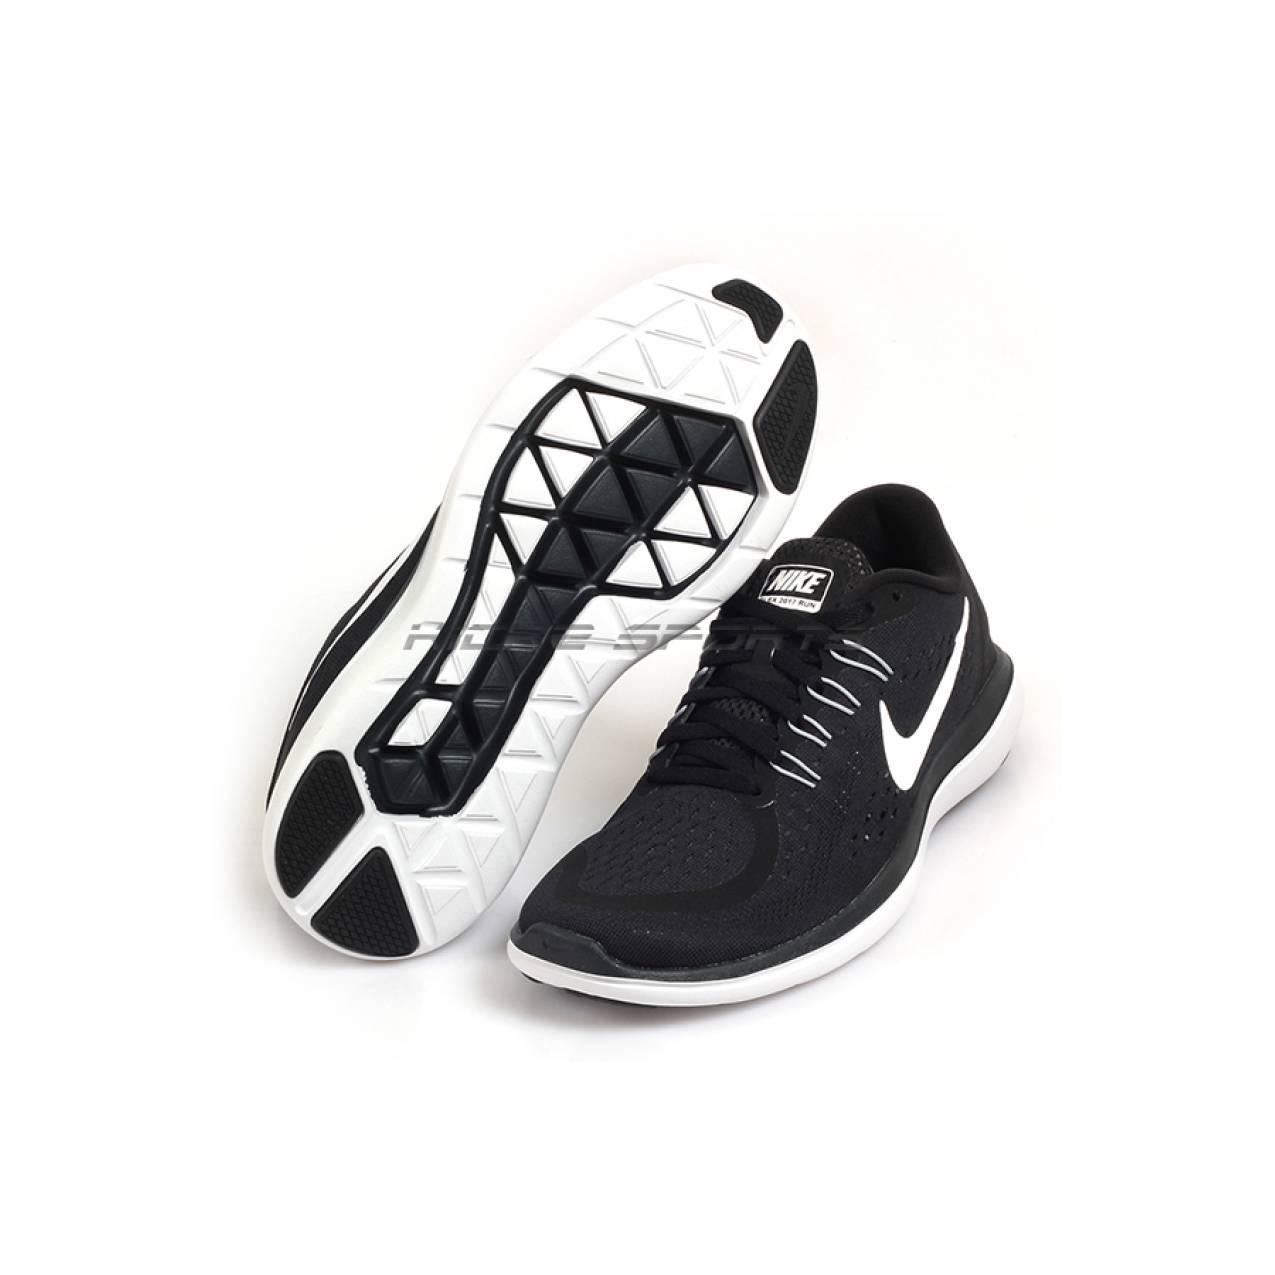 [ORIGINAL] Sepatu RUNNING NIKE WMNS FLEX 2017 898476-001 Black